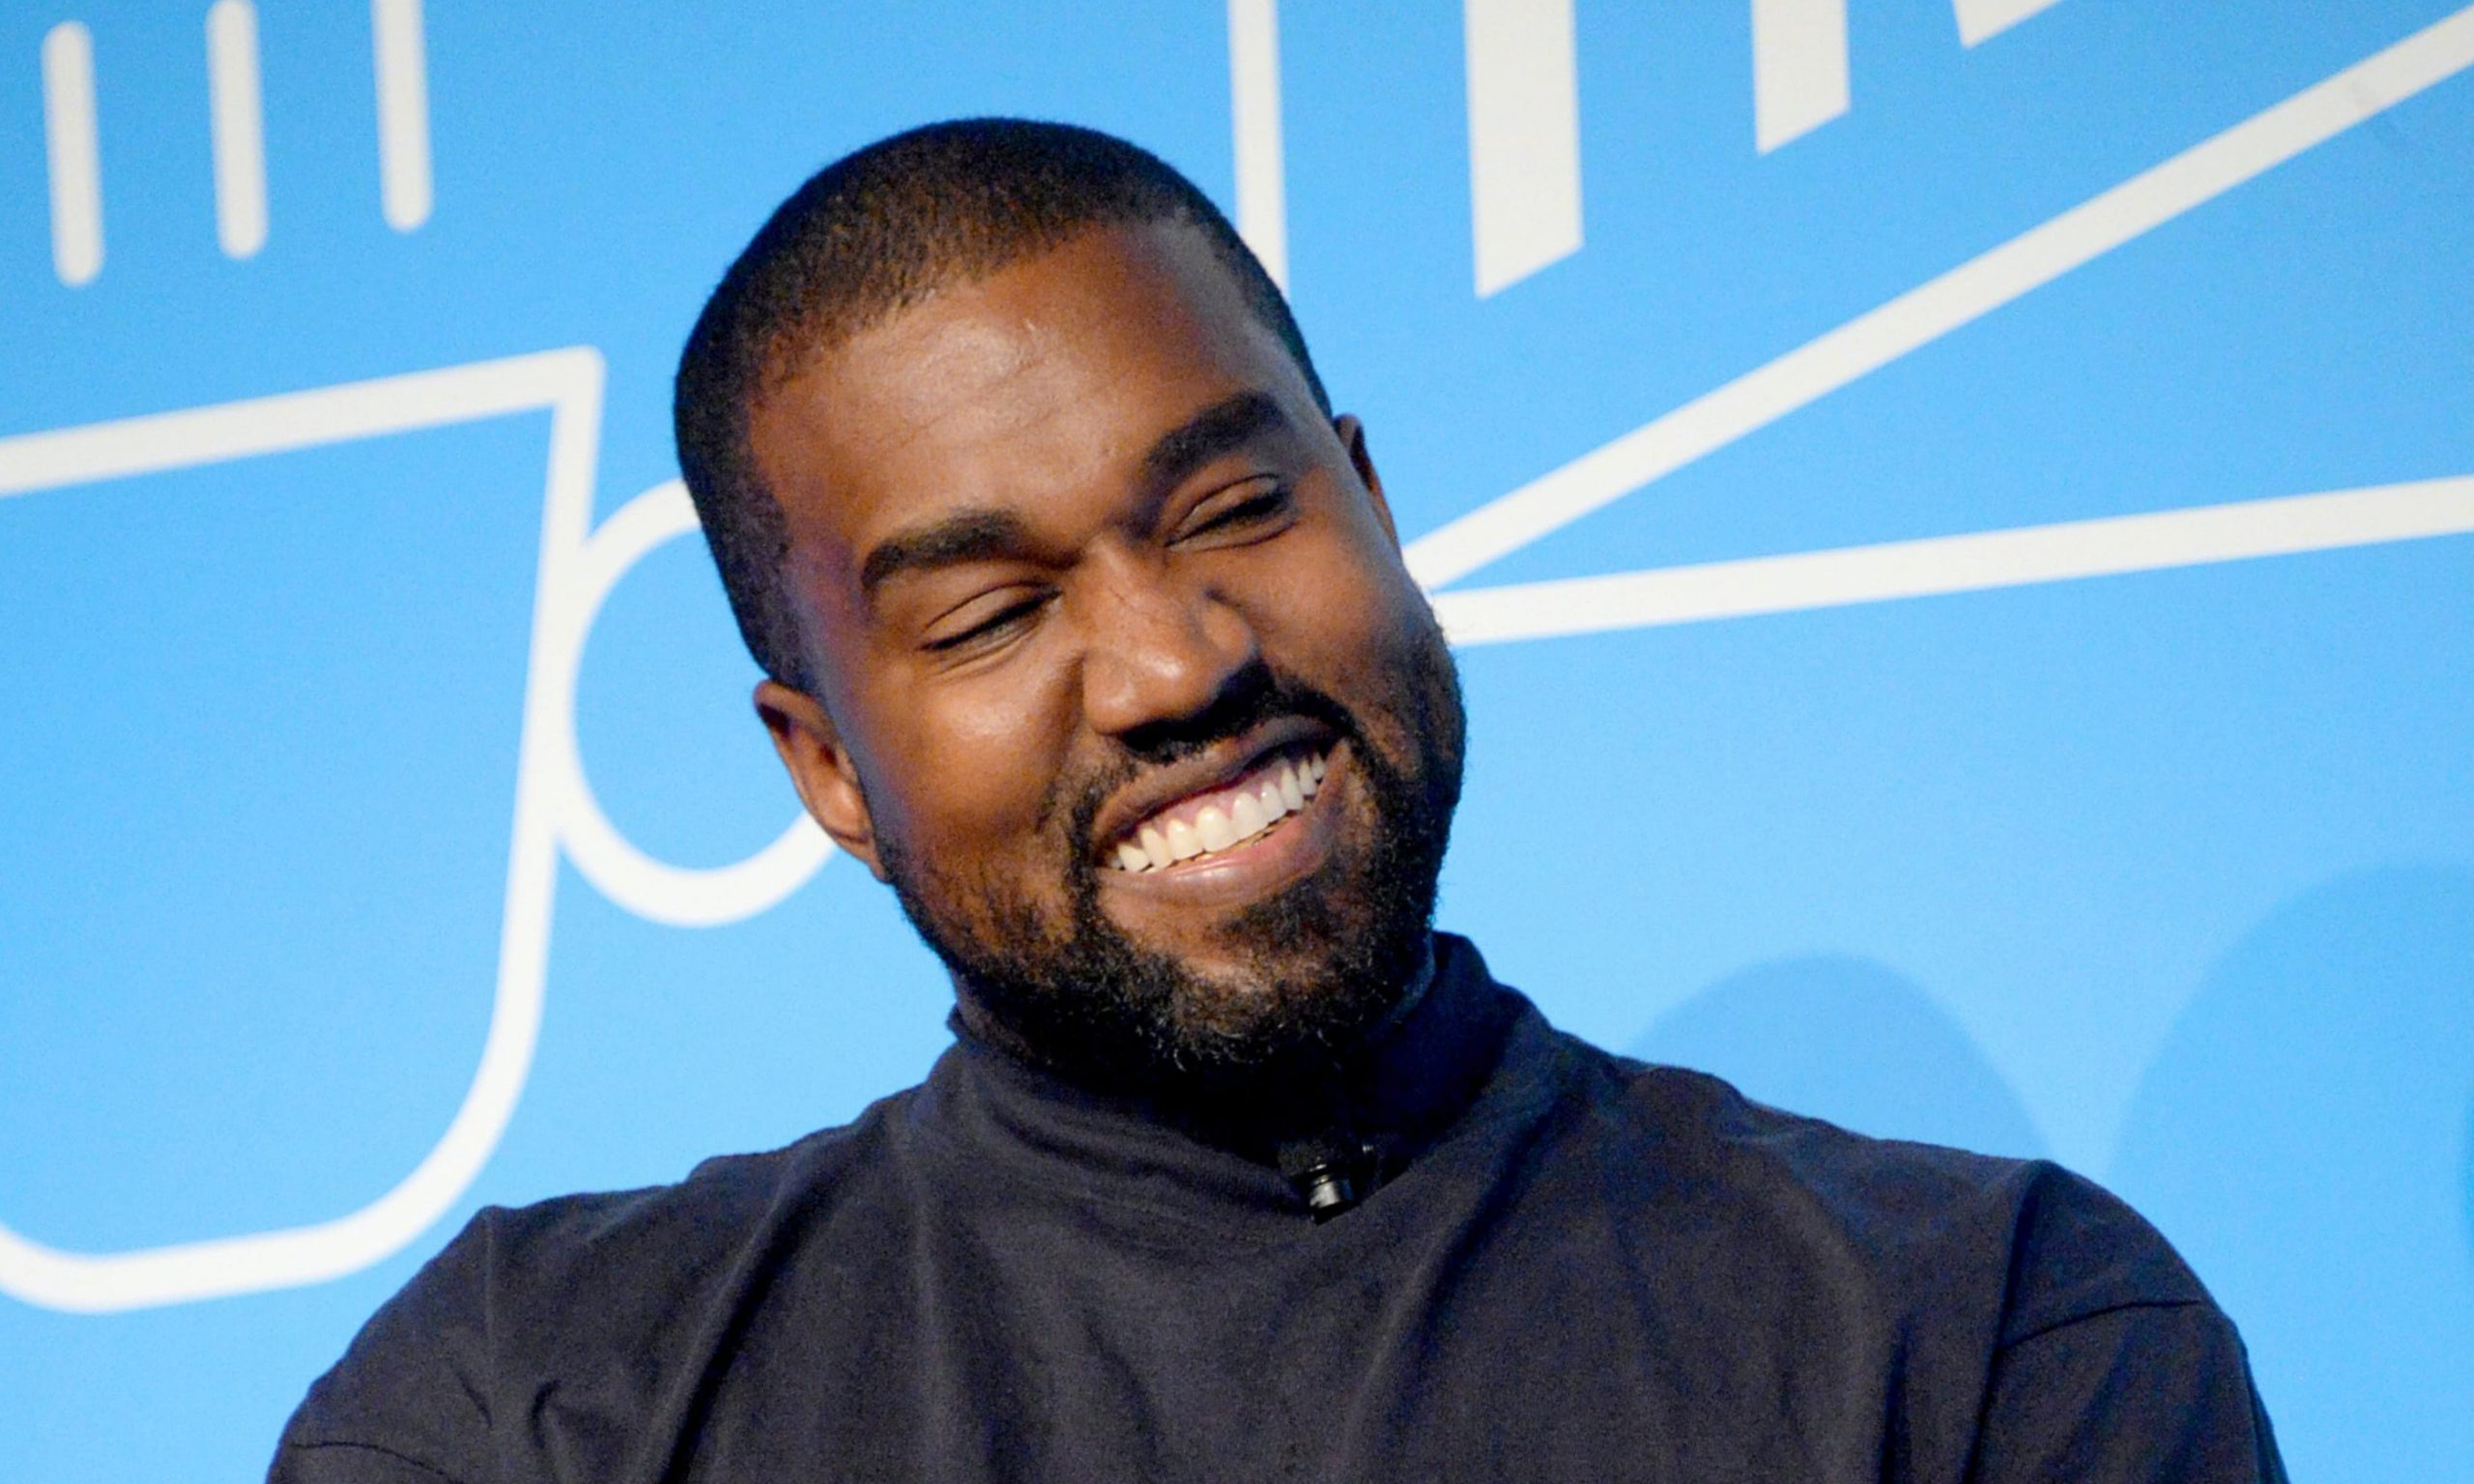 Kanye West 个人纪录片将在下半年于 Netflix 上映